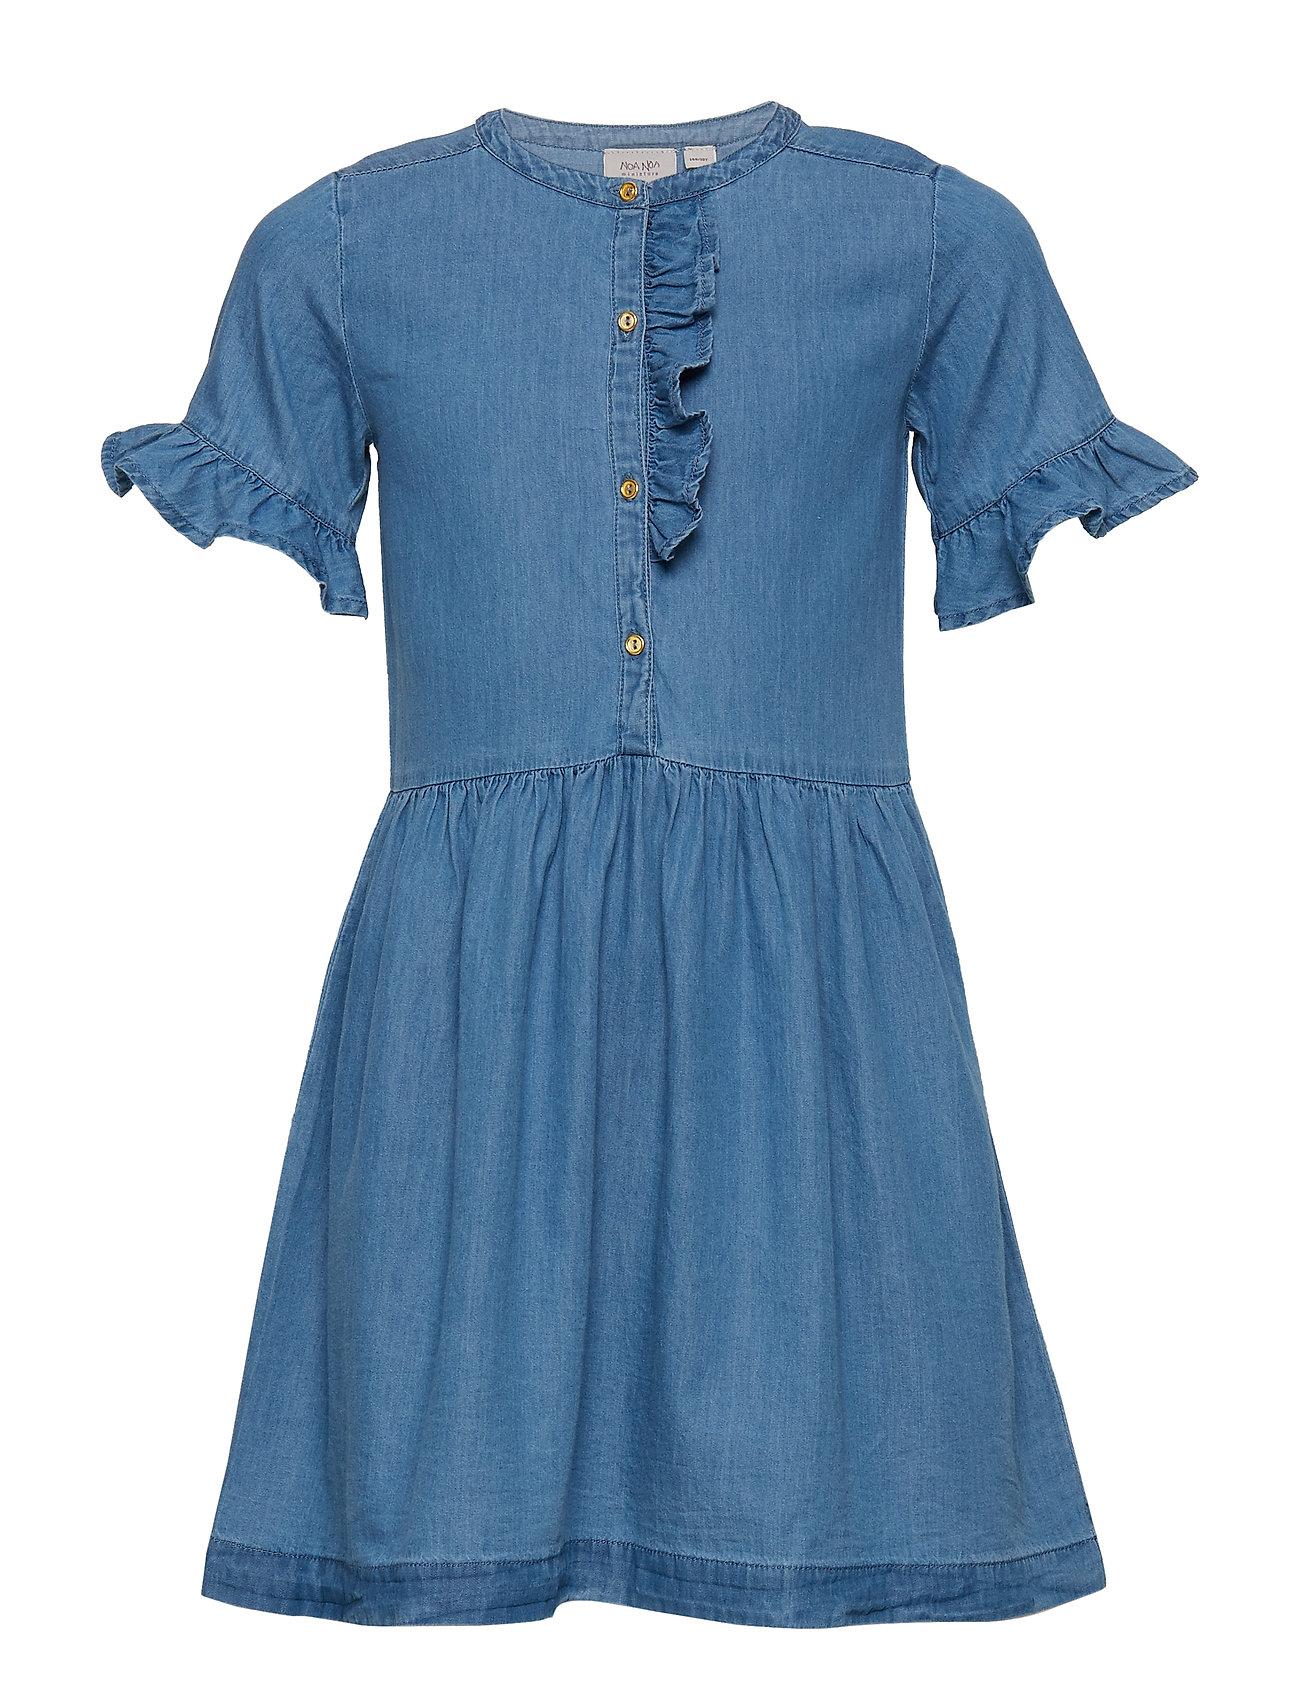 ed9293fd085 NAVY PEONY Noa Noa Miniature Dress Short Sleeve kjoler for børn ...